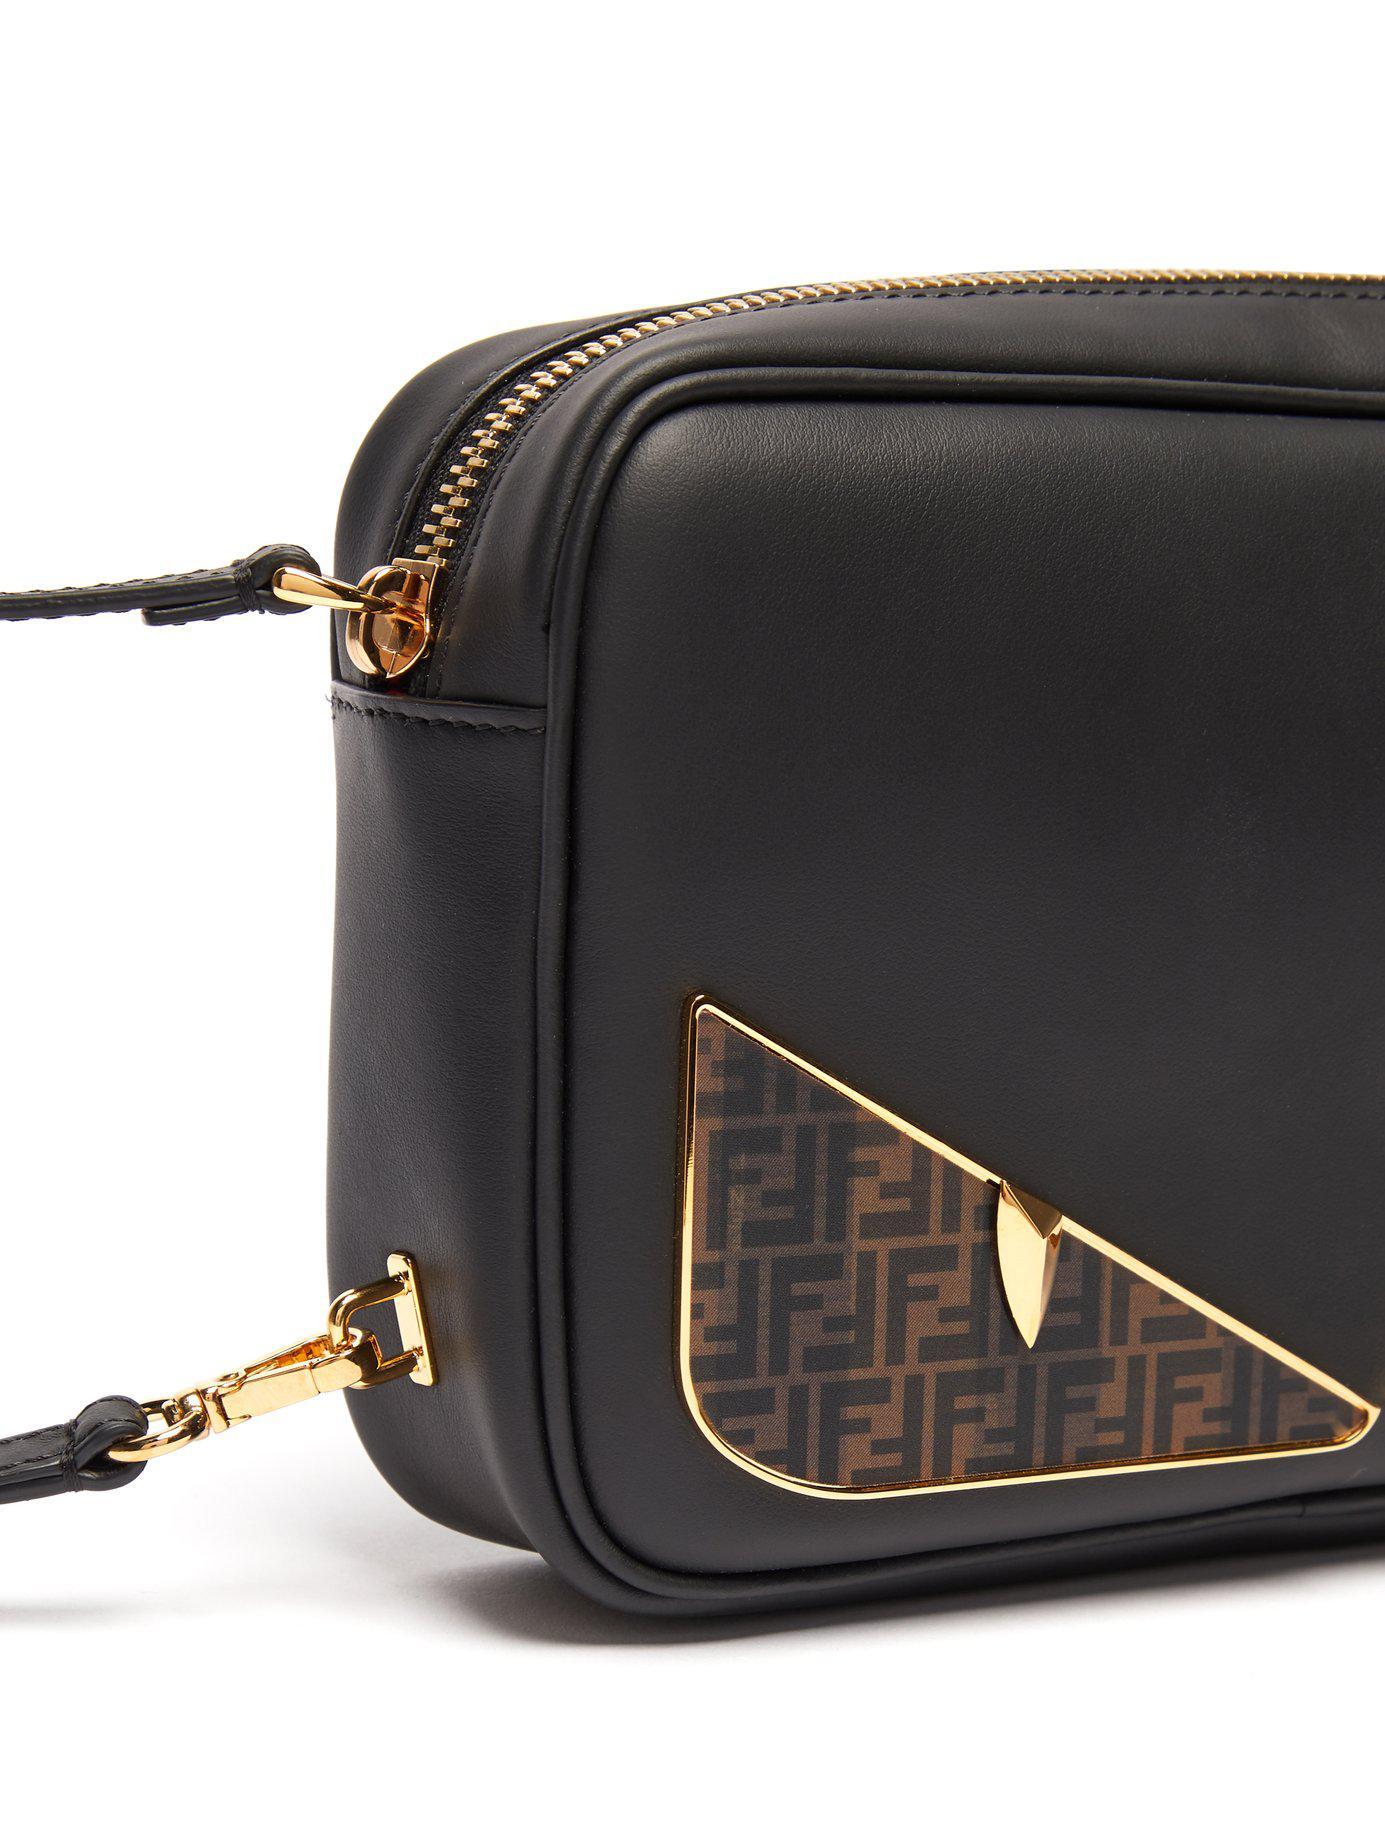 Lyst - Fendi Bag Bugs Logo Eyes Leather Camera Bag in Black for Men ... 374a1b21b06c5